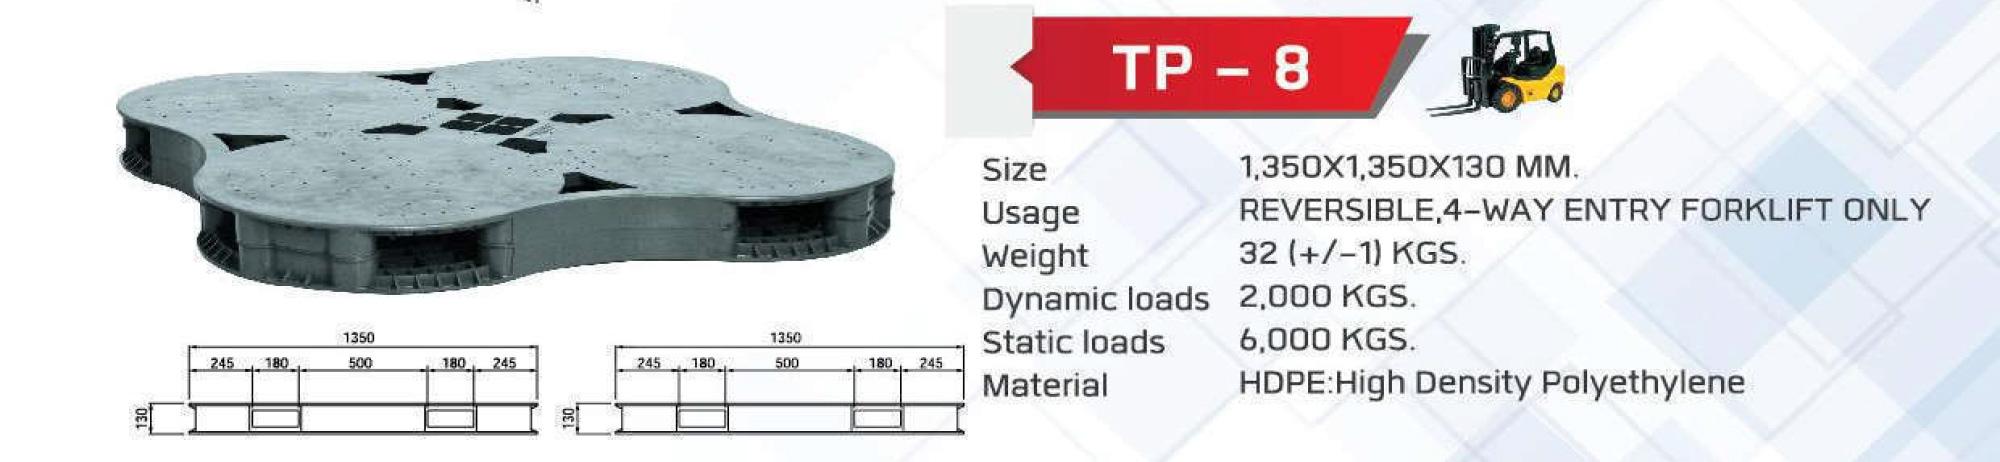 Reversible-HeavyDuty-TP-8